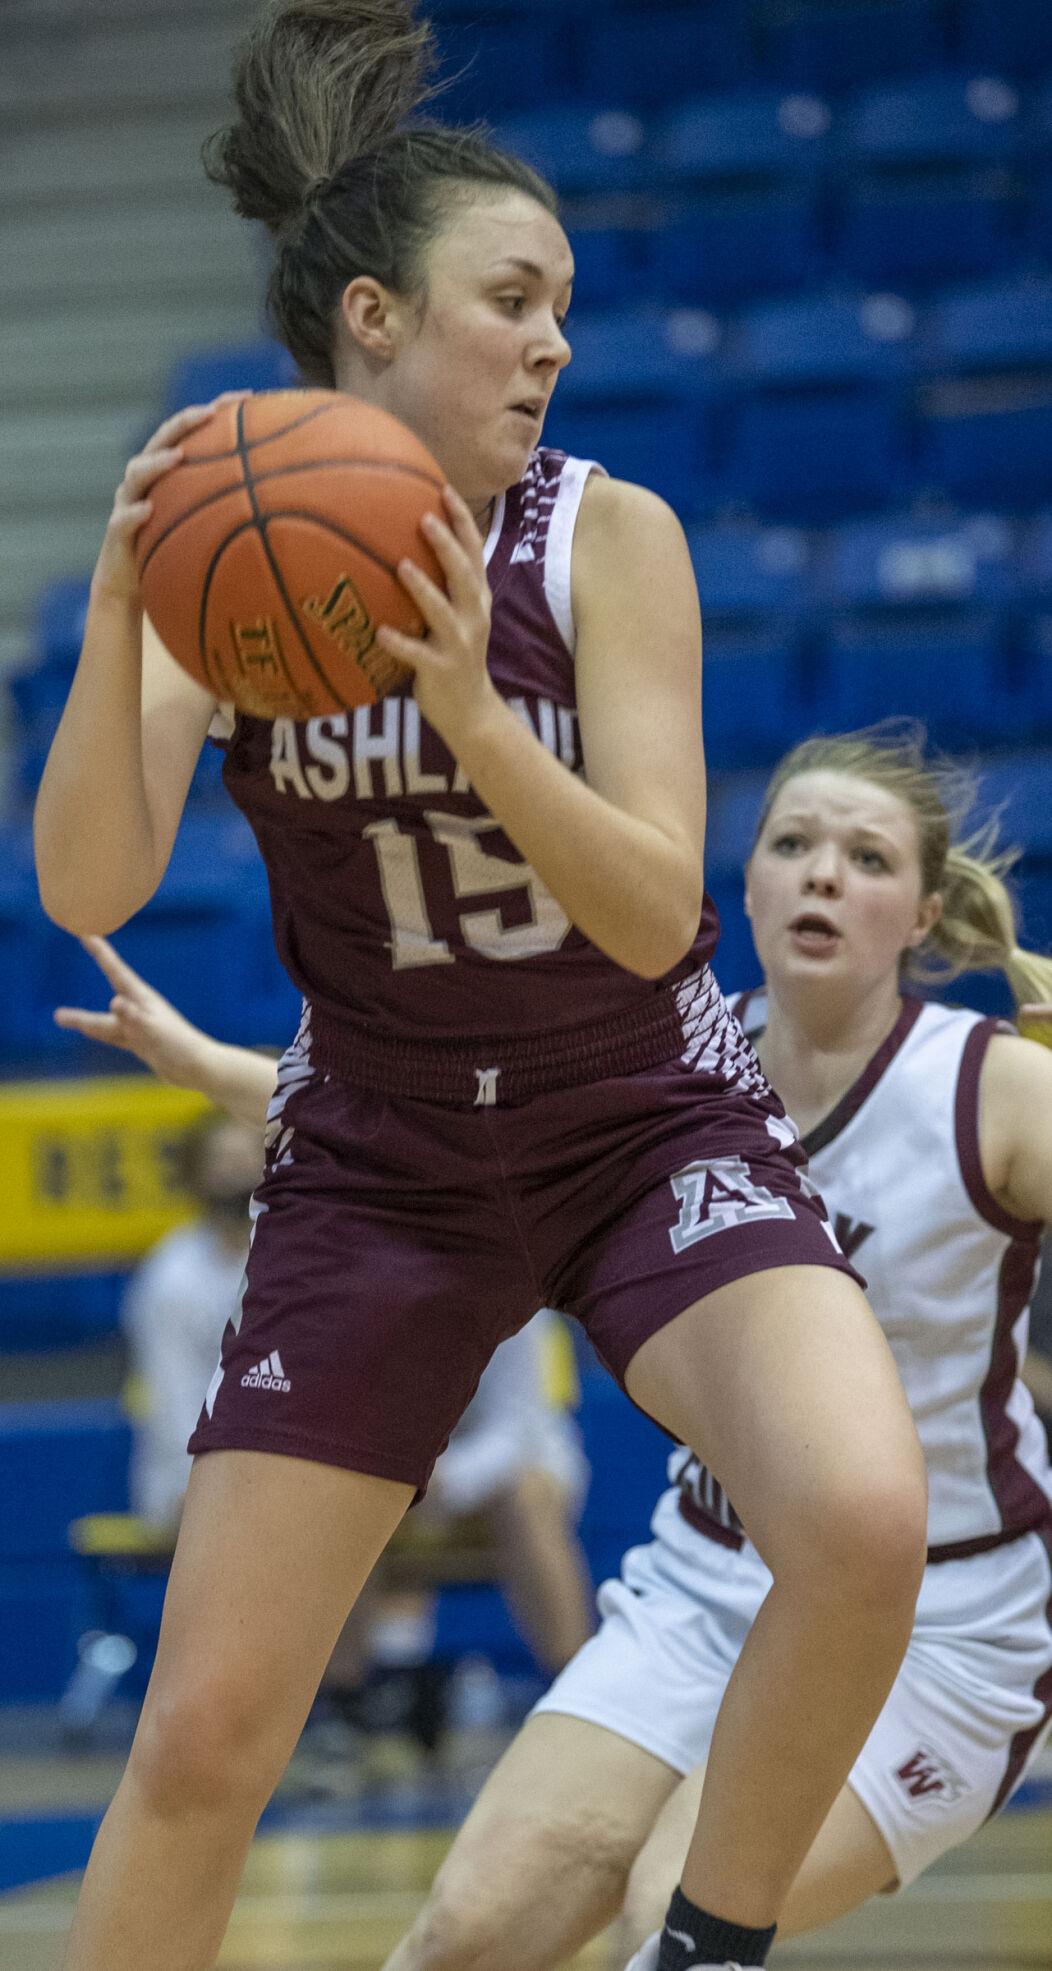 West Carter v Ashland Girls Regional